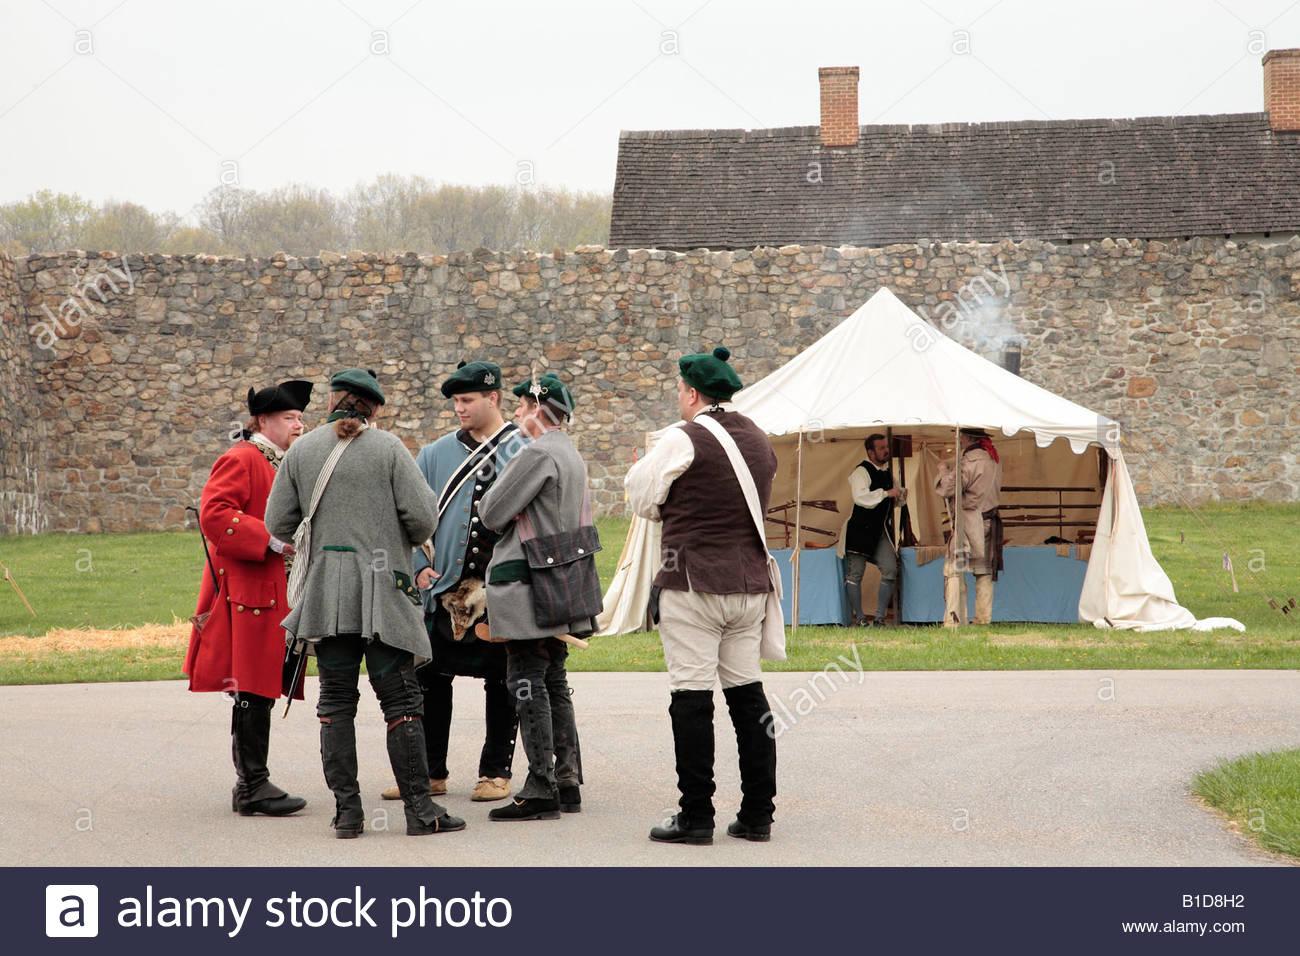 Reenactors gather near a sutler's booth at the Market Fair at an